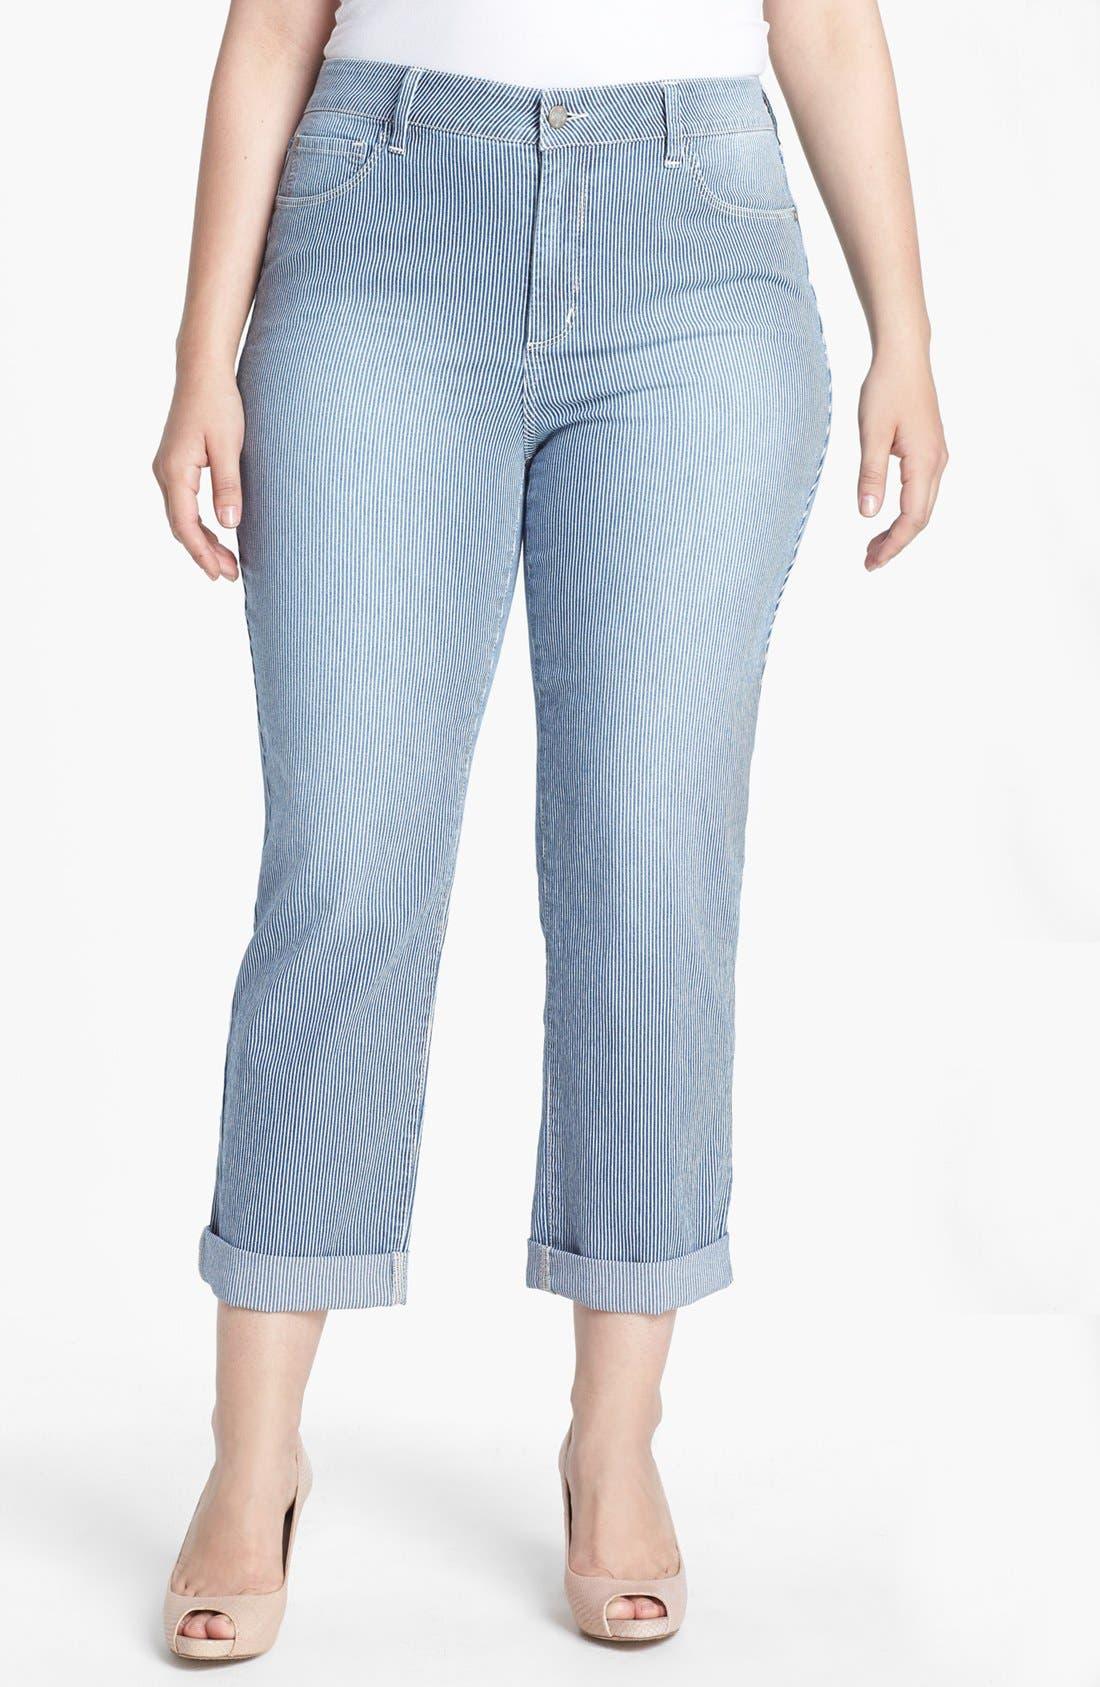 Main Image - NYDJ 'Tanya' Railroad Stripe Boyfriend Jeans (Plus Size)